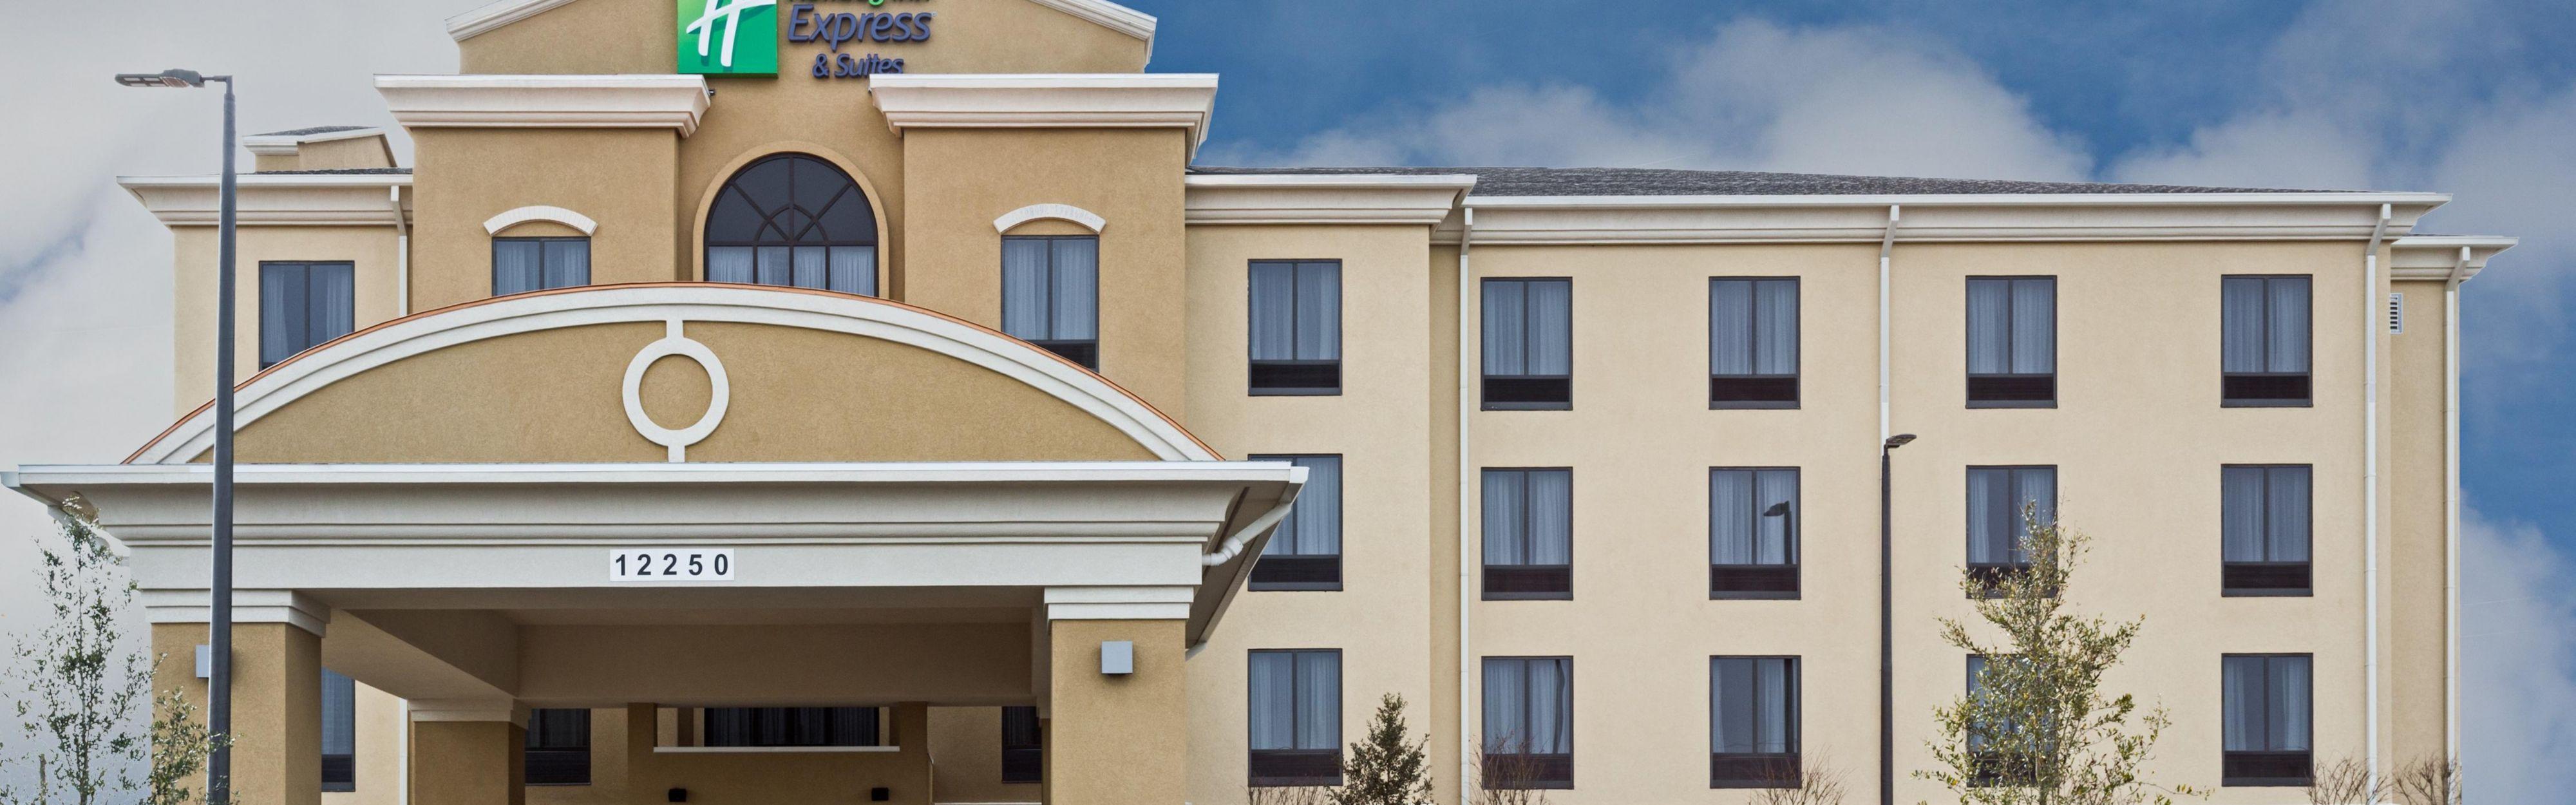 Hotels Near Colonial Drive Orlando